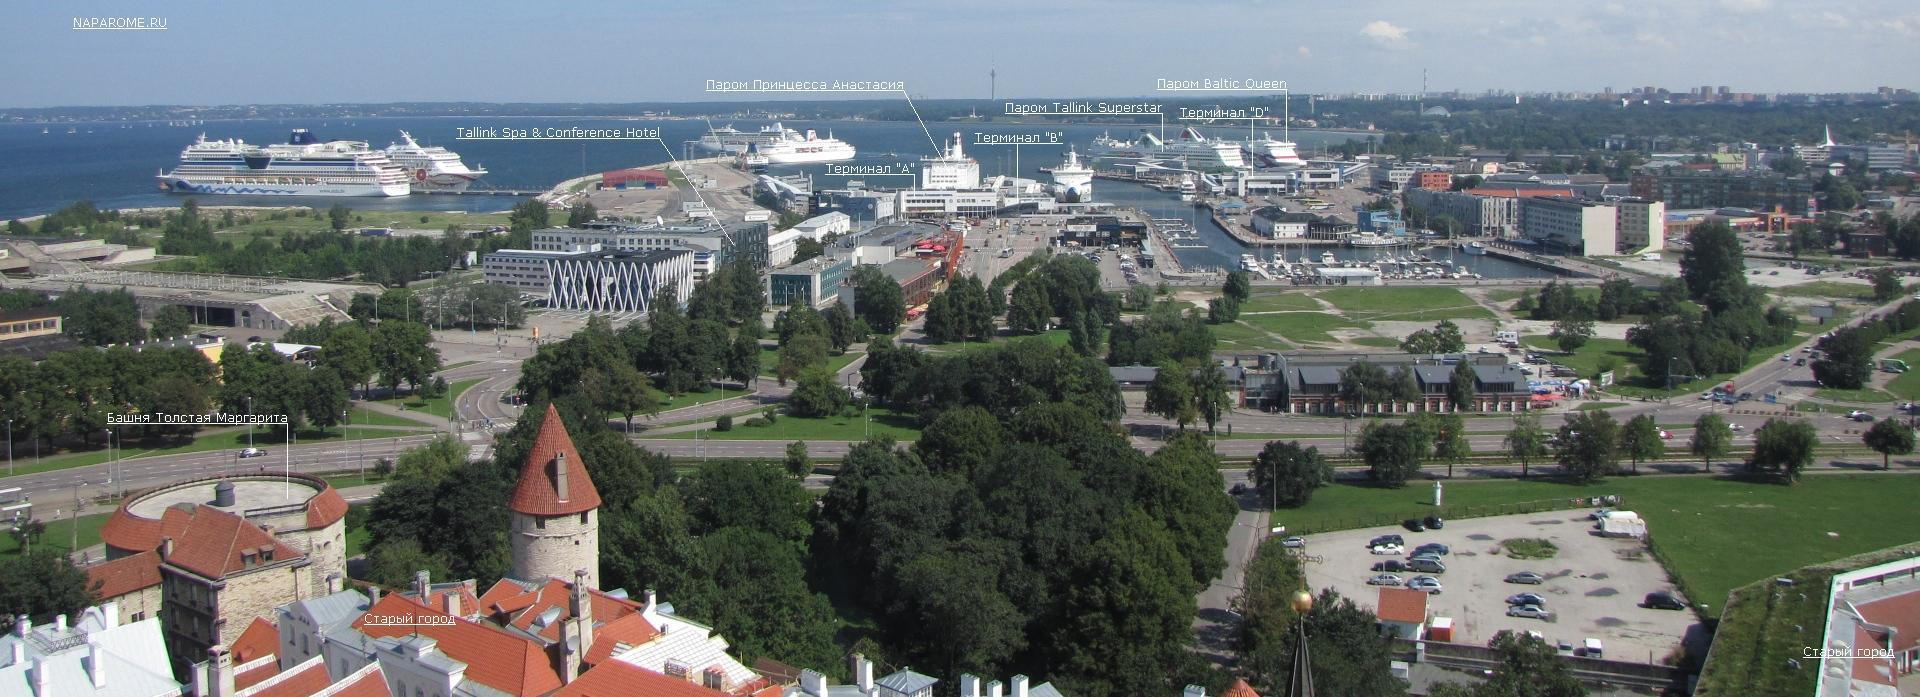 NAPAROME.RU / Таллиннский порт. Терминалы A. B, D. Паромы Принцесса Анастасия, Tallink Superfast, Baltic Queen.  Фото из Старого города